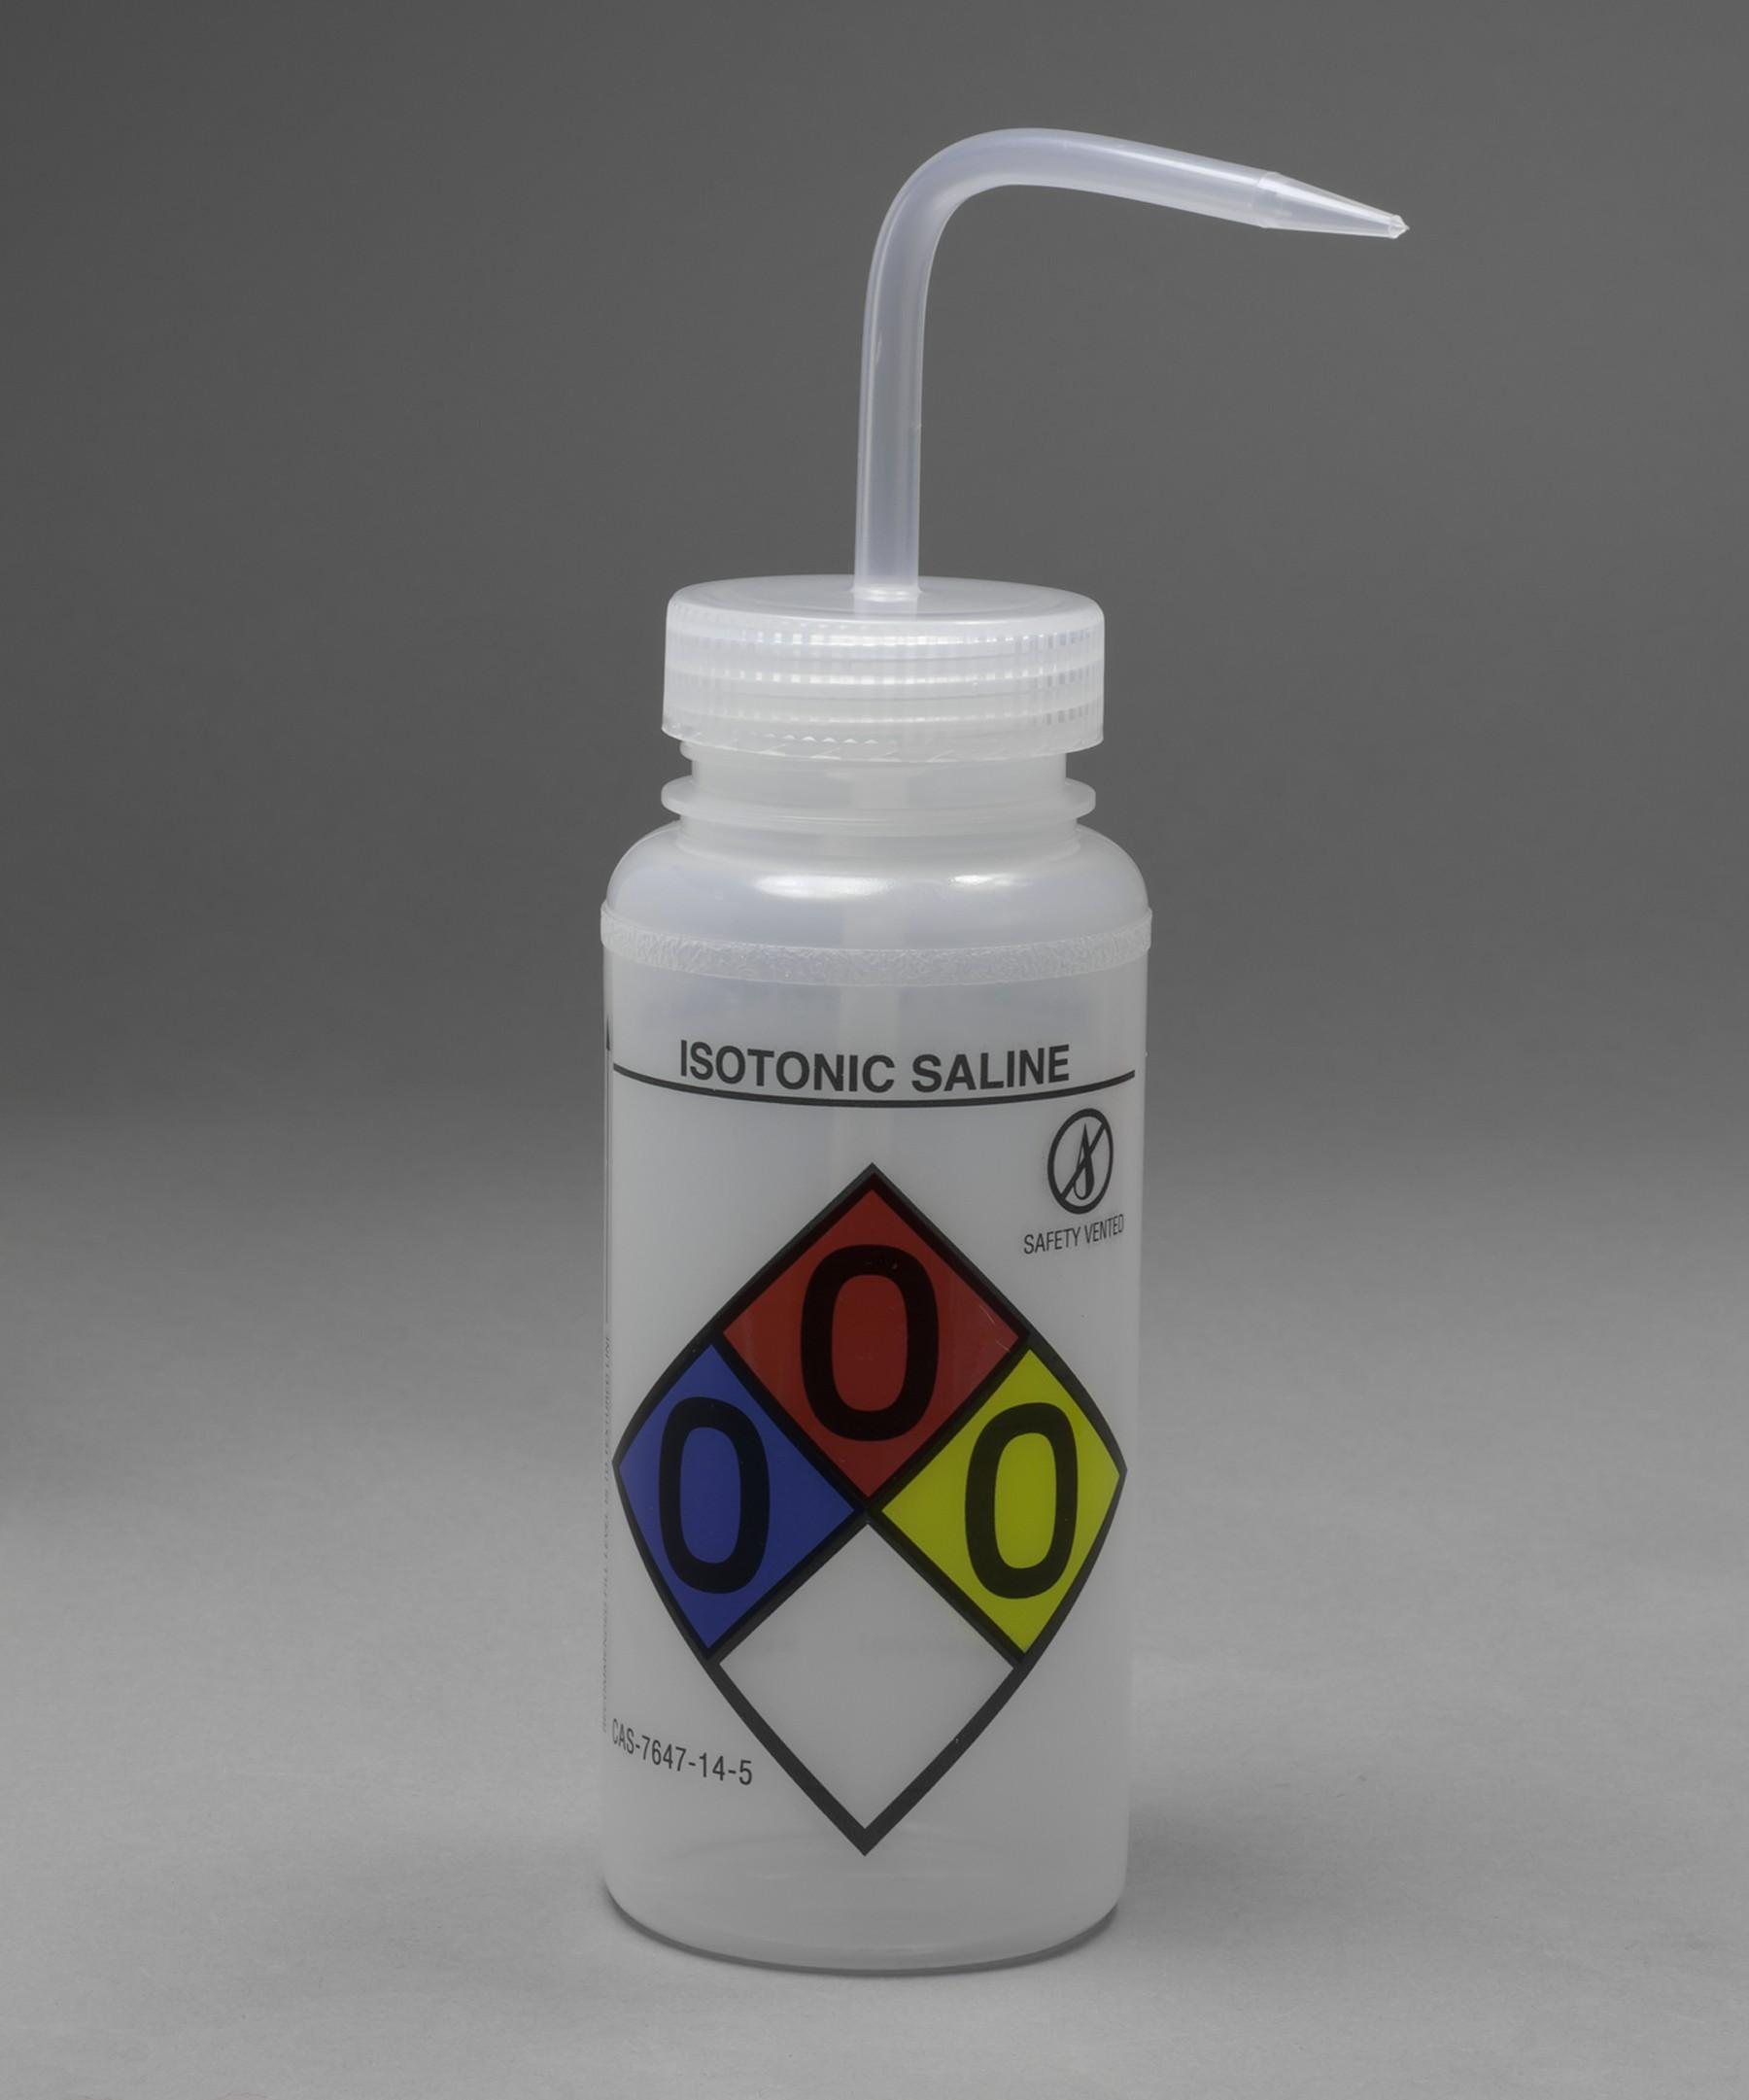 Bel-Art GHS Labeled Safety-Vented Isotonic Saline Wash